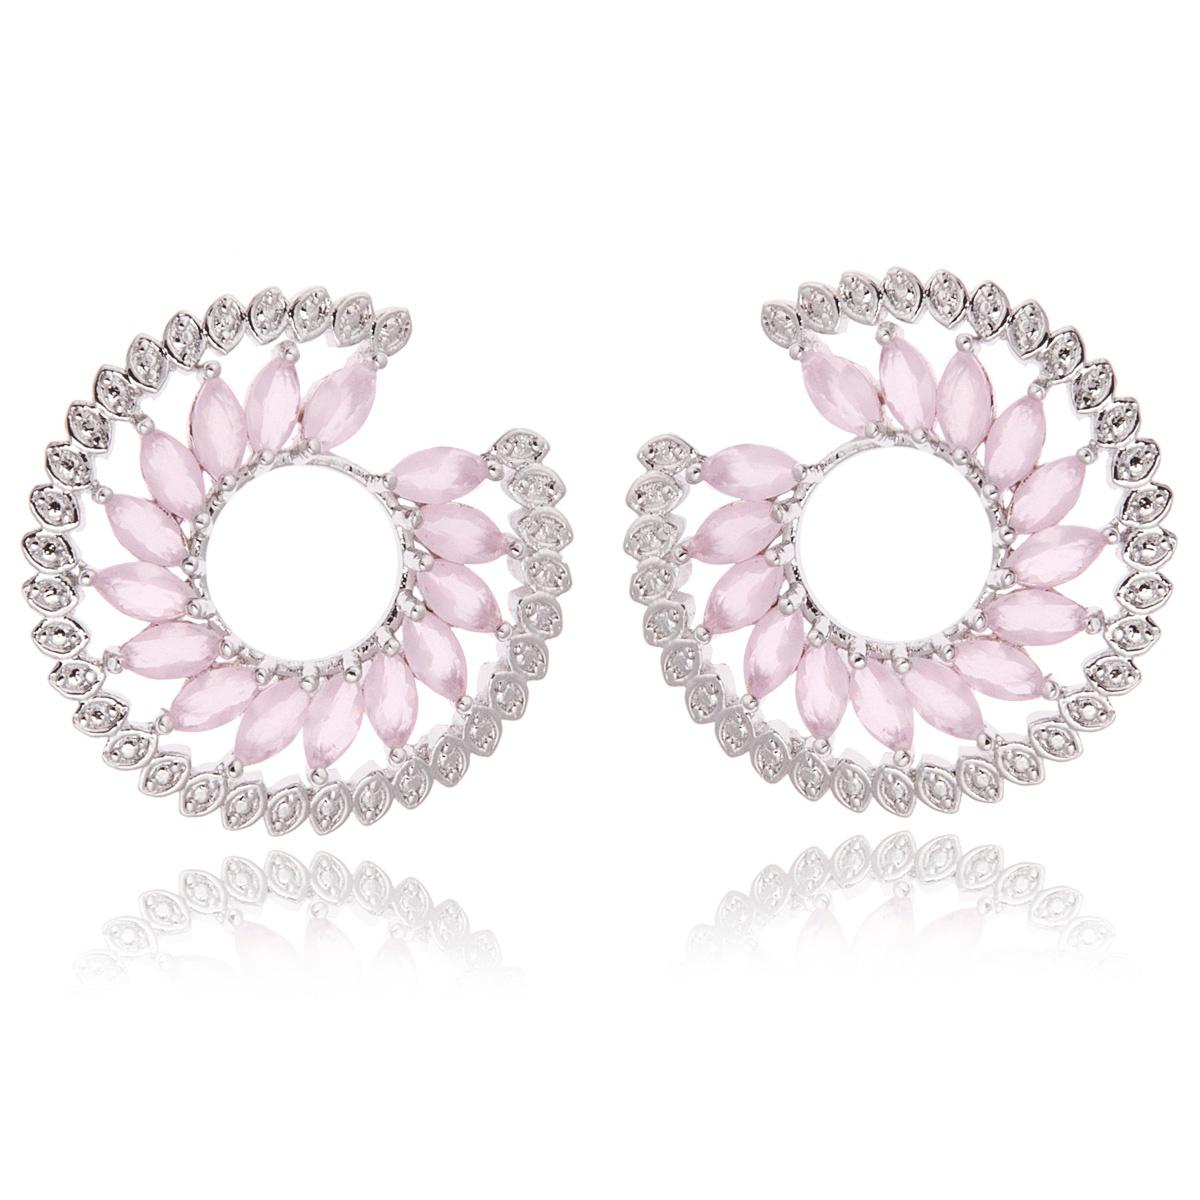 Brinco Espiral Luxury Semijoia em Ródio Branco com Zircônia Quartzo Rosa  - Soloyou